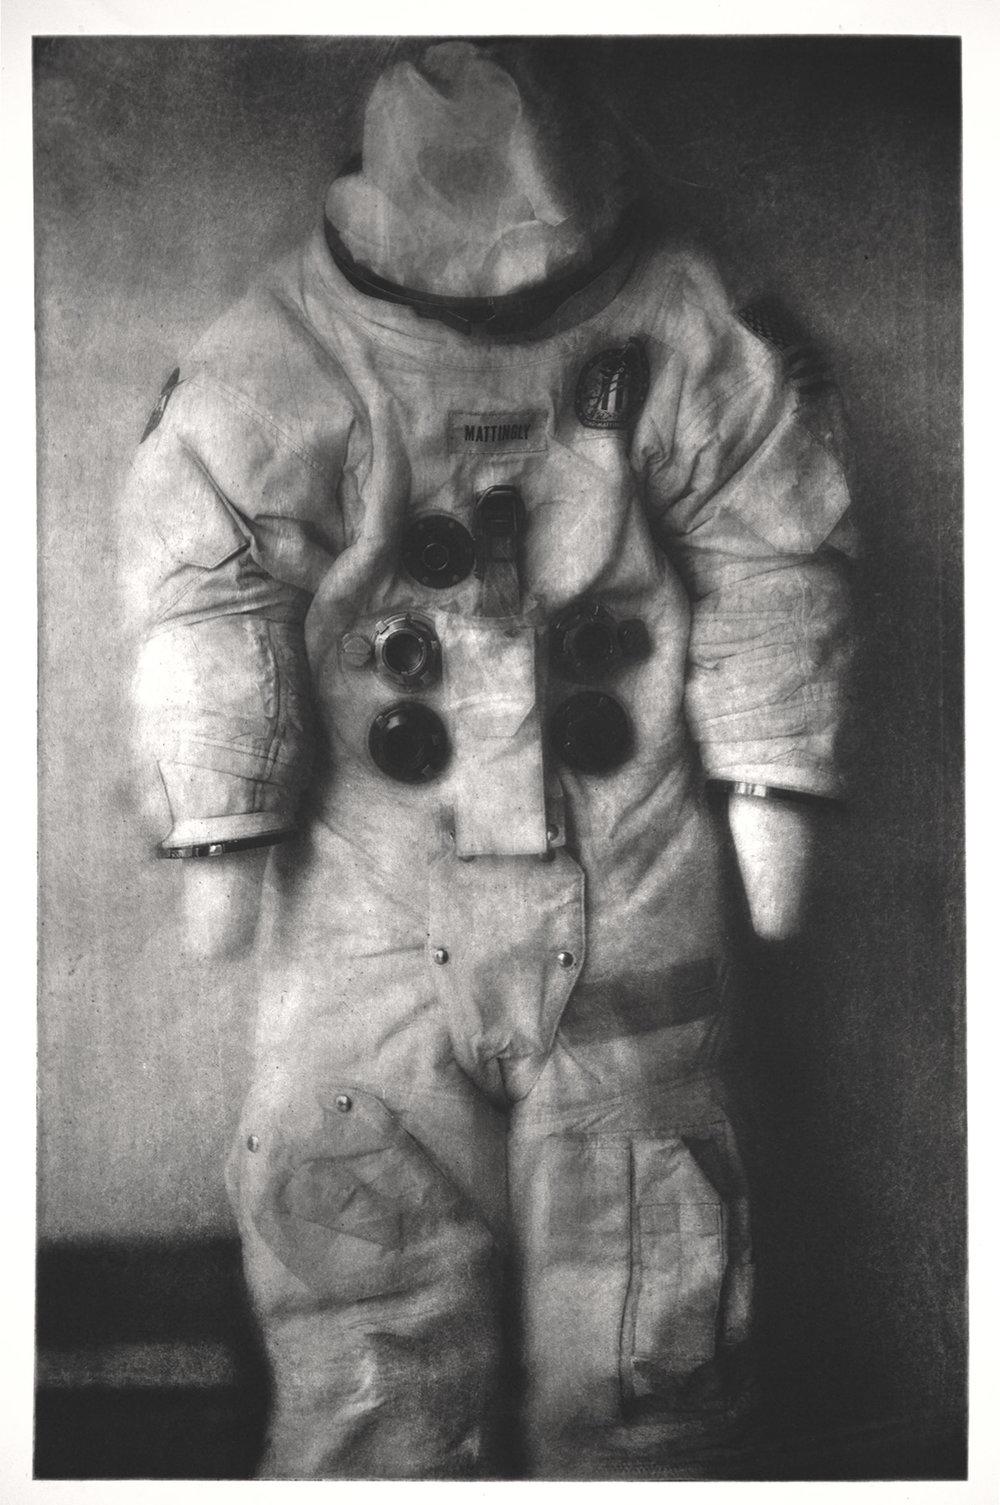 Ken Mattingly's Apollo XIII Suit